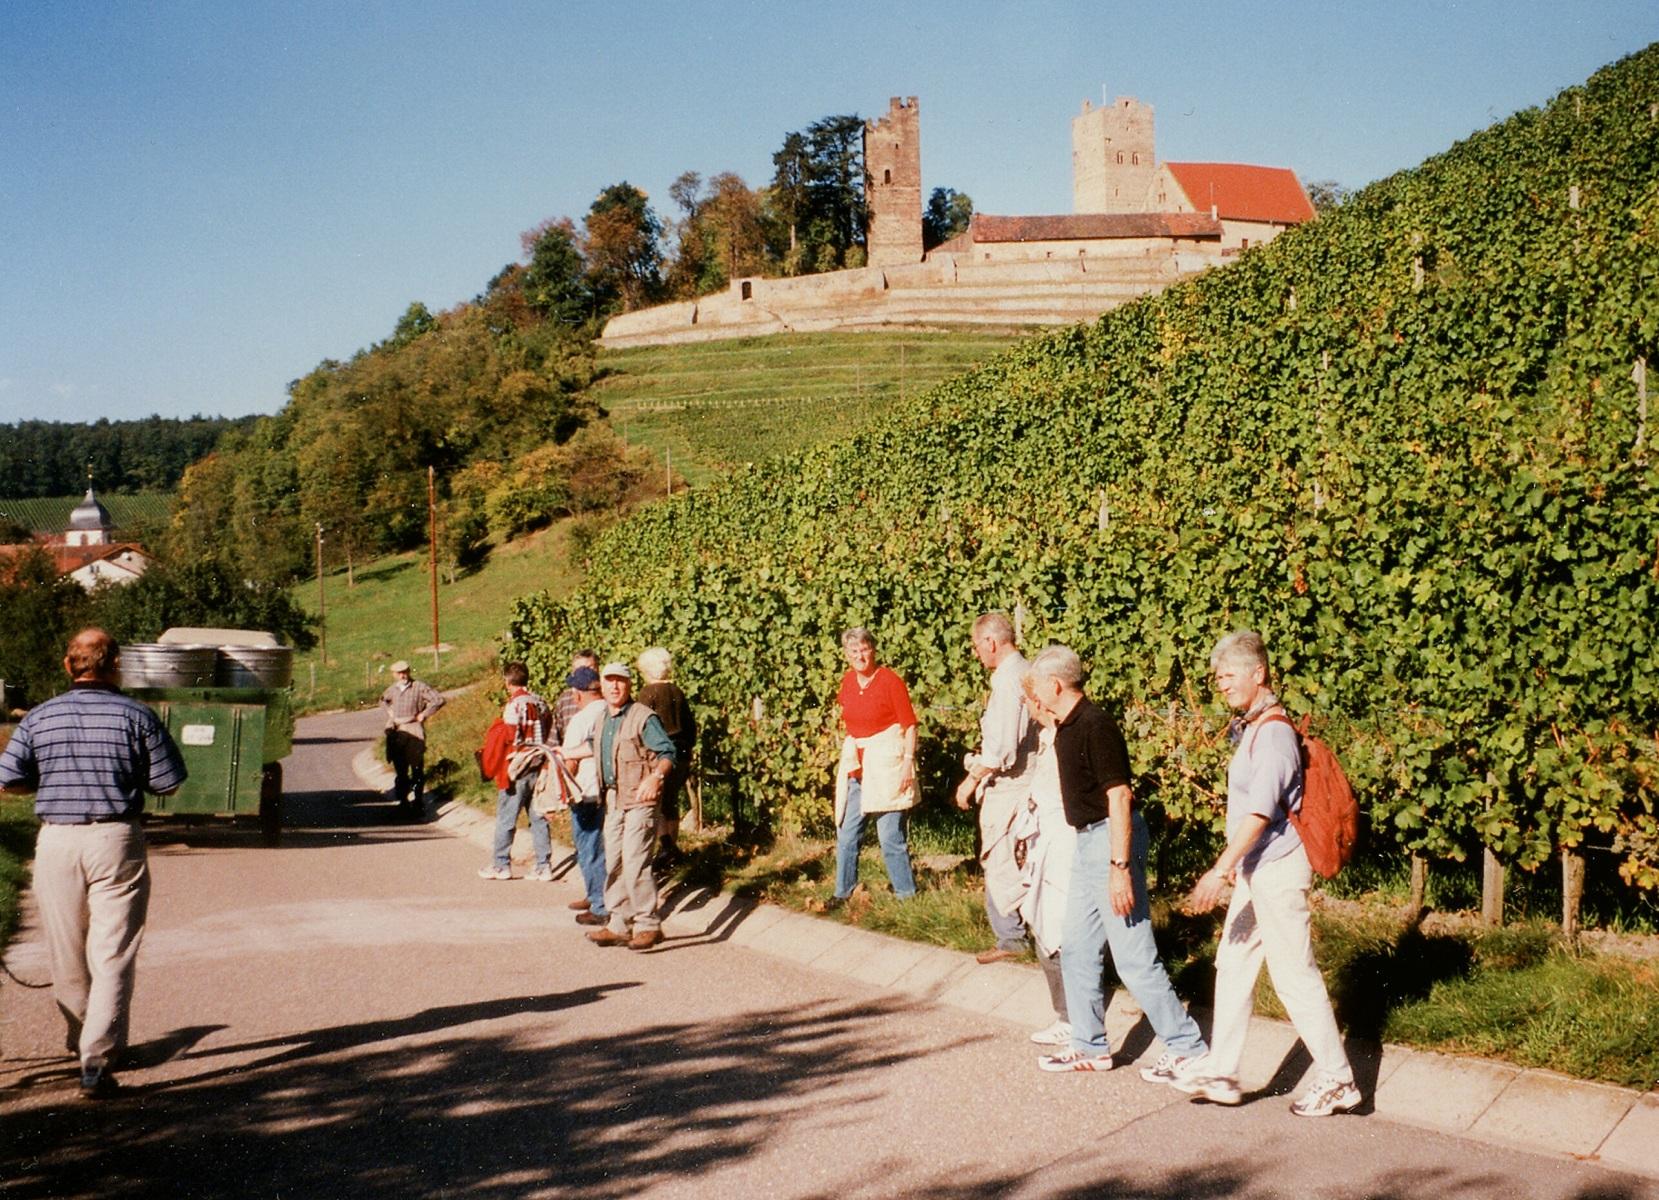 2001_10_10 Brackenheim, Wandern zur Burg Neipperg